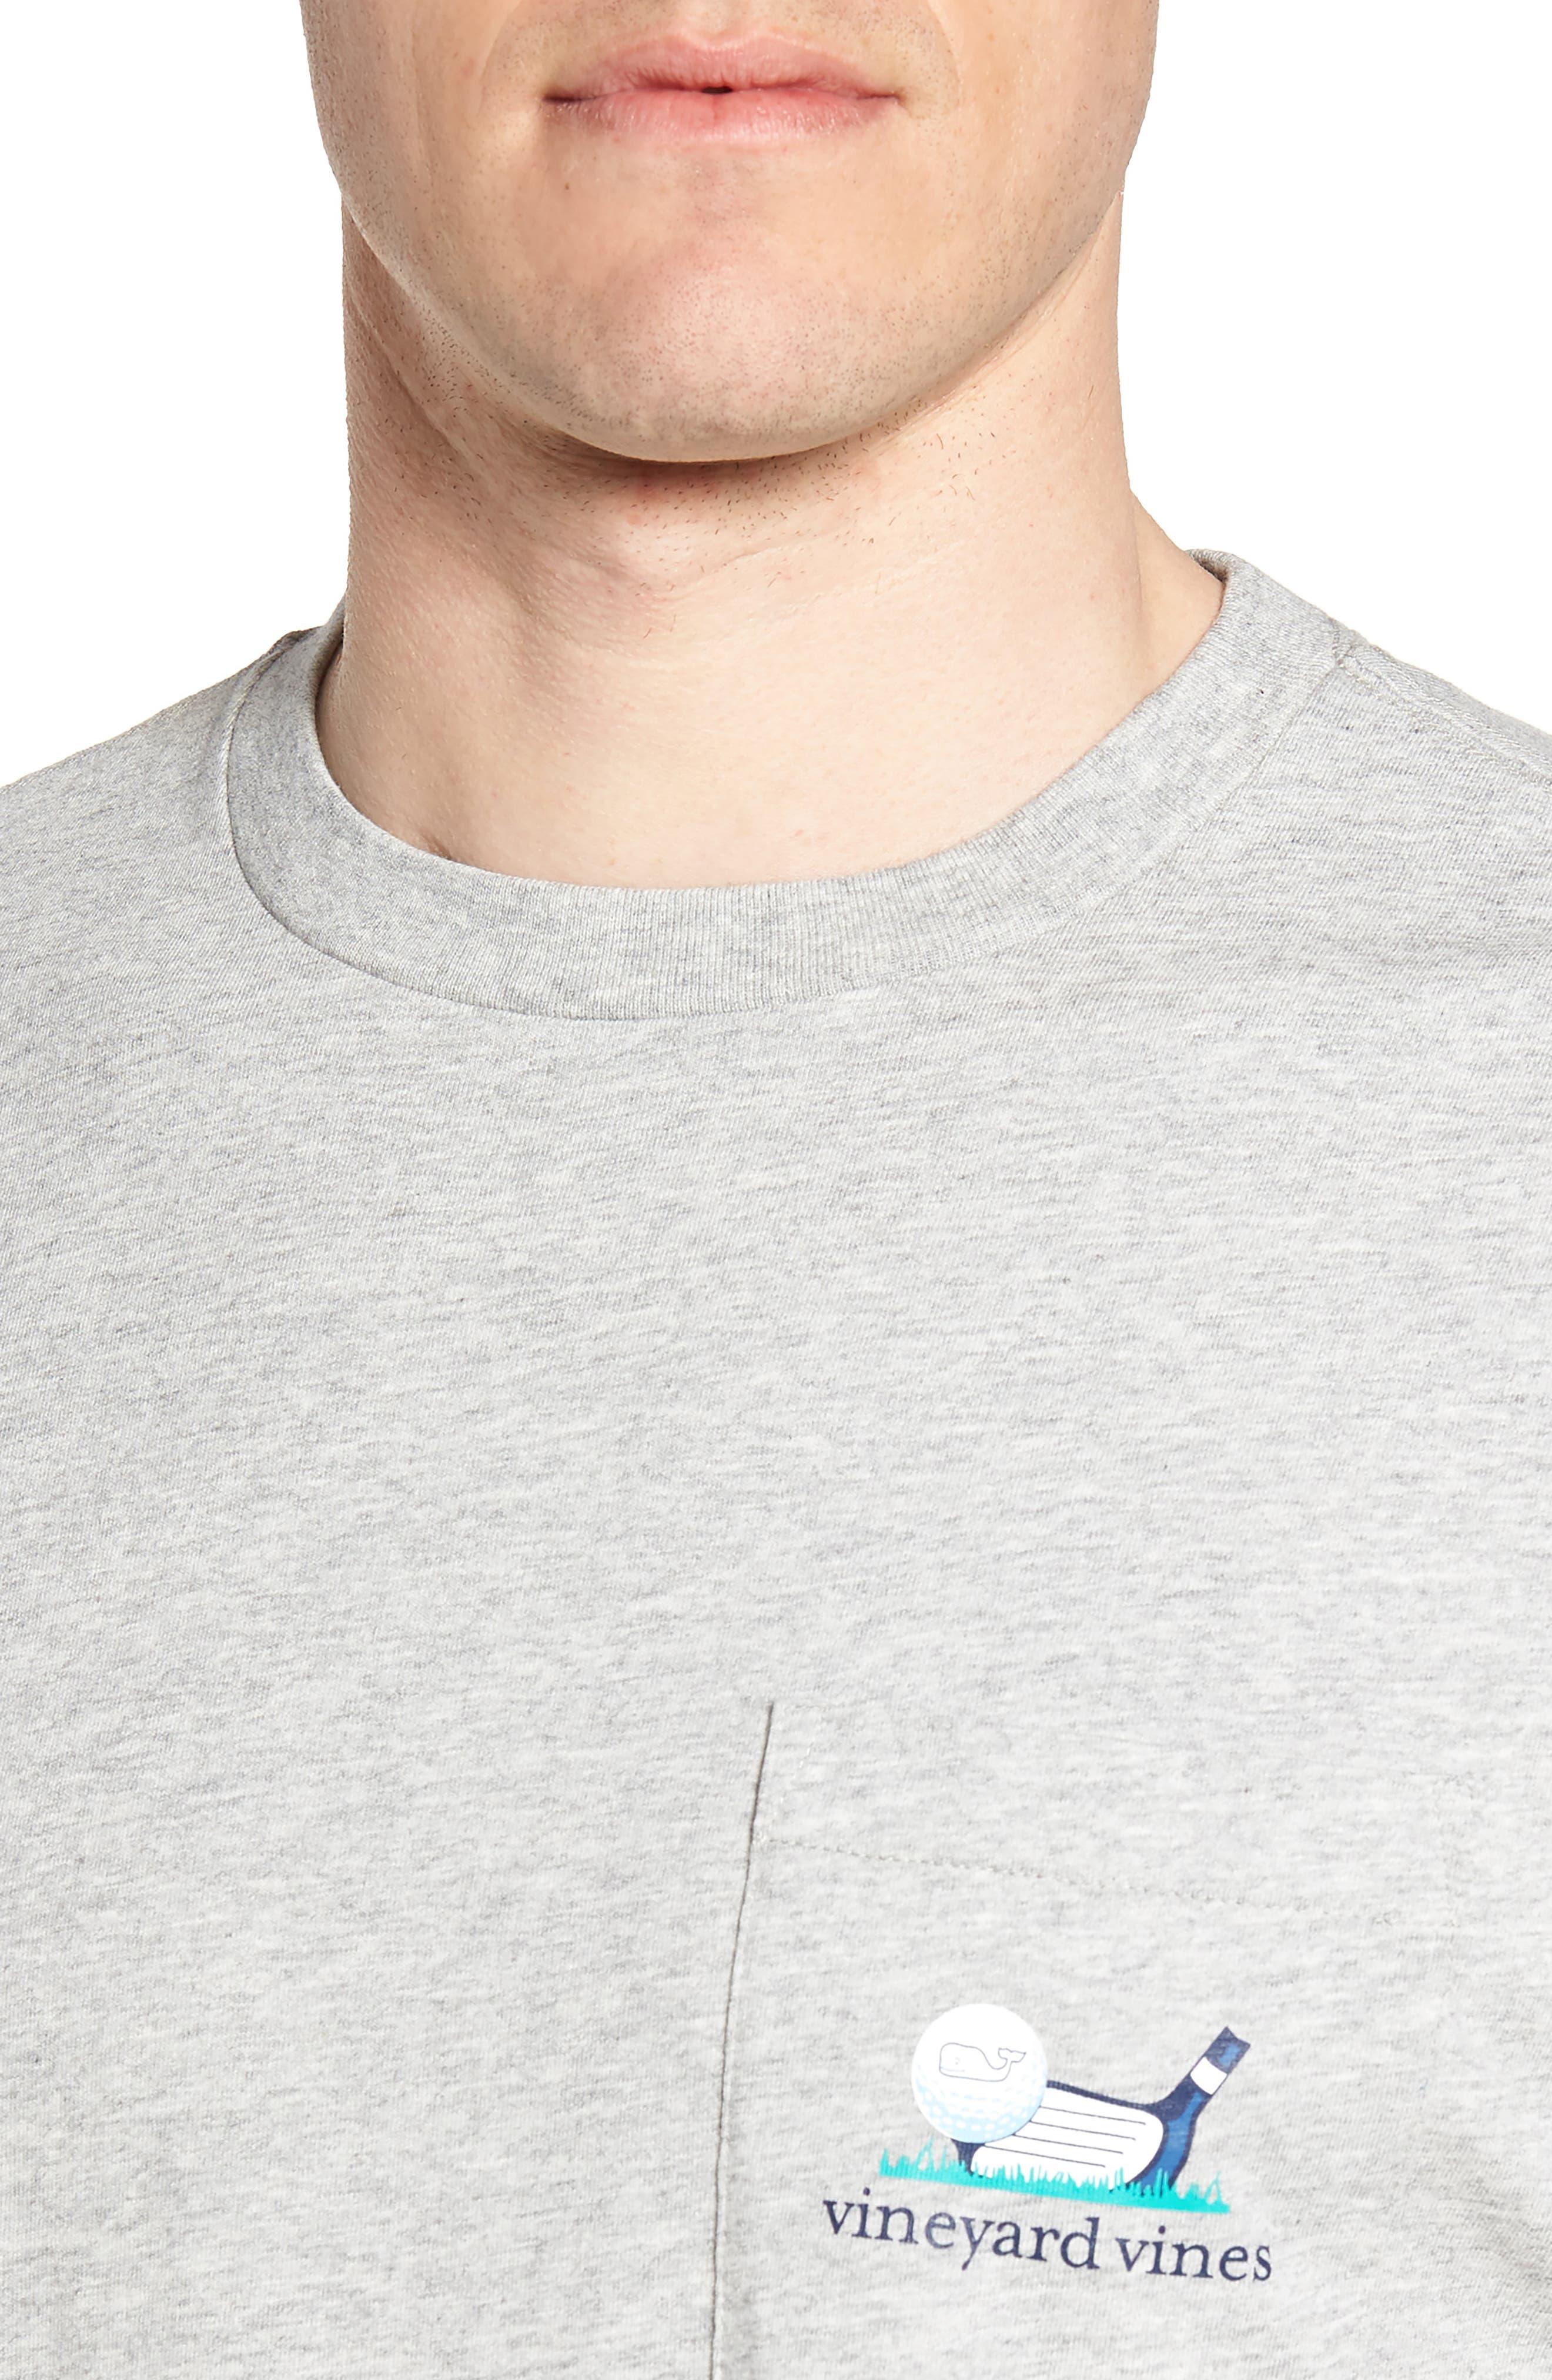 Regular Fit Golf T-Shirt,                             Alternate thumbnail 4, color,                             039